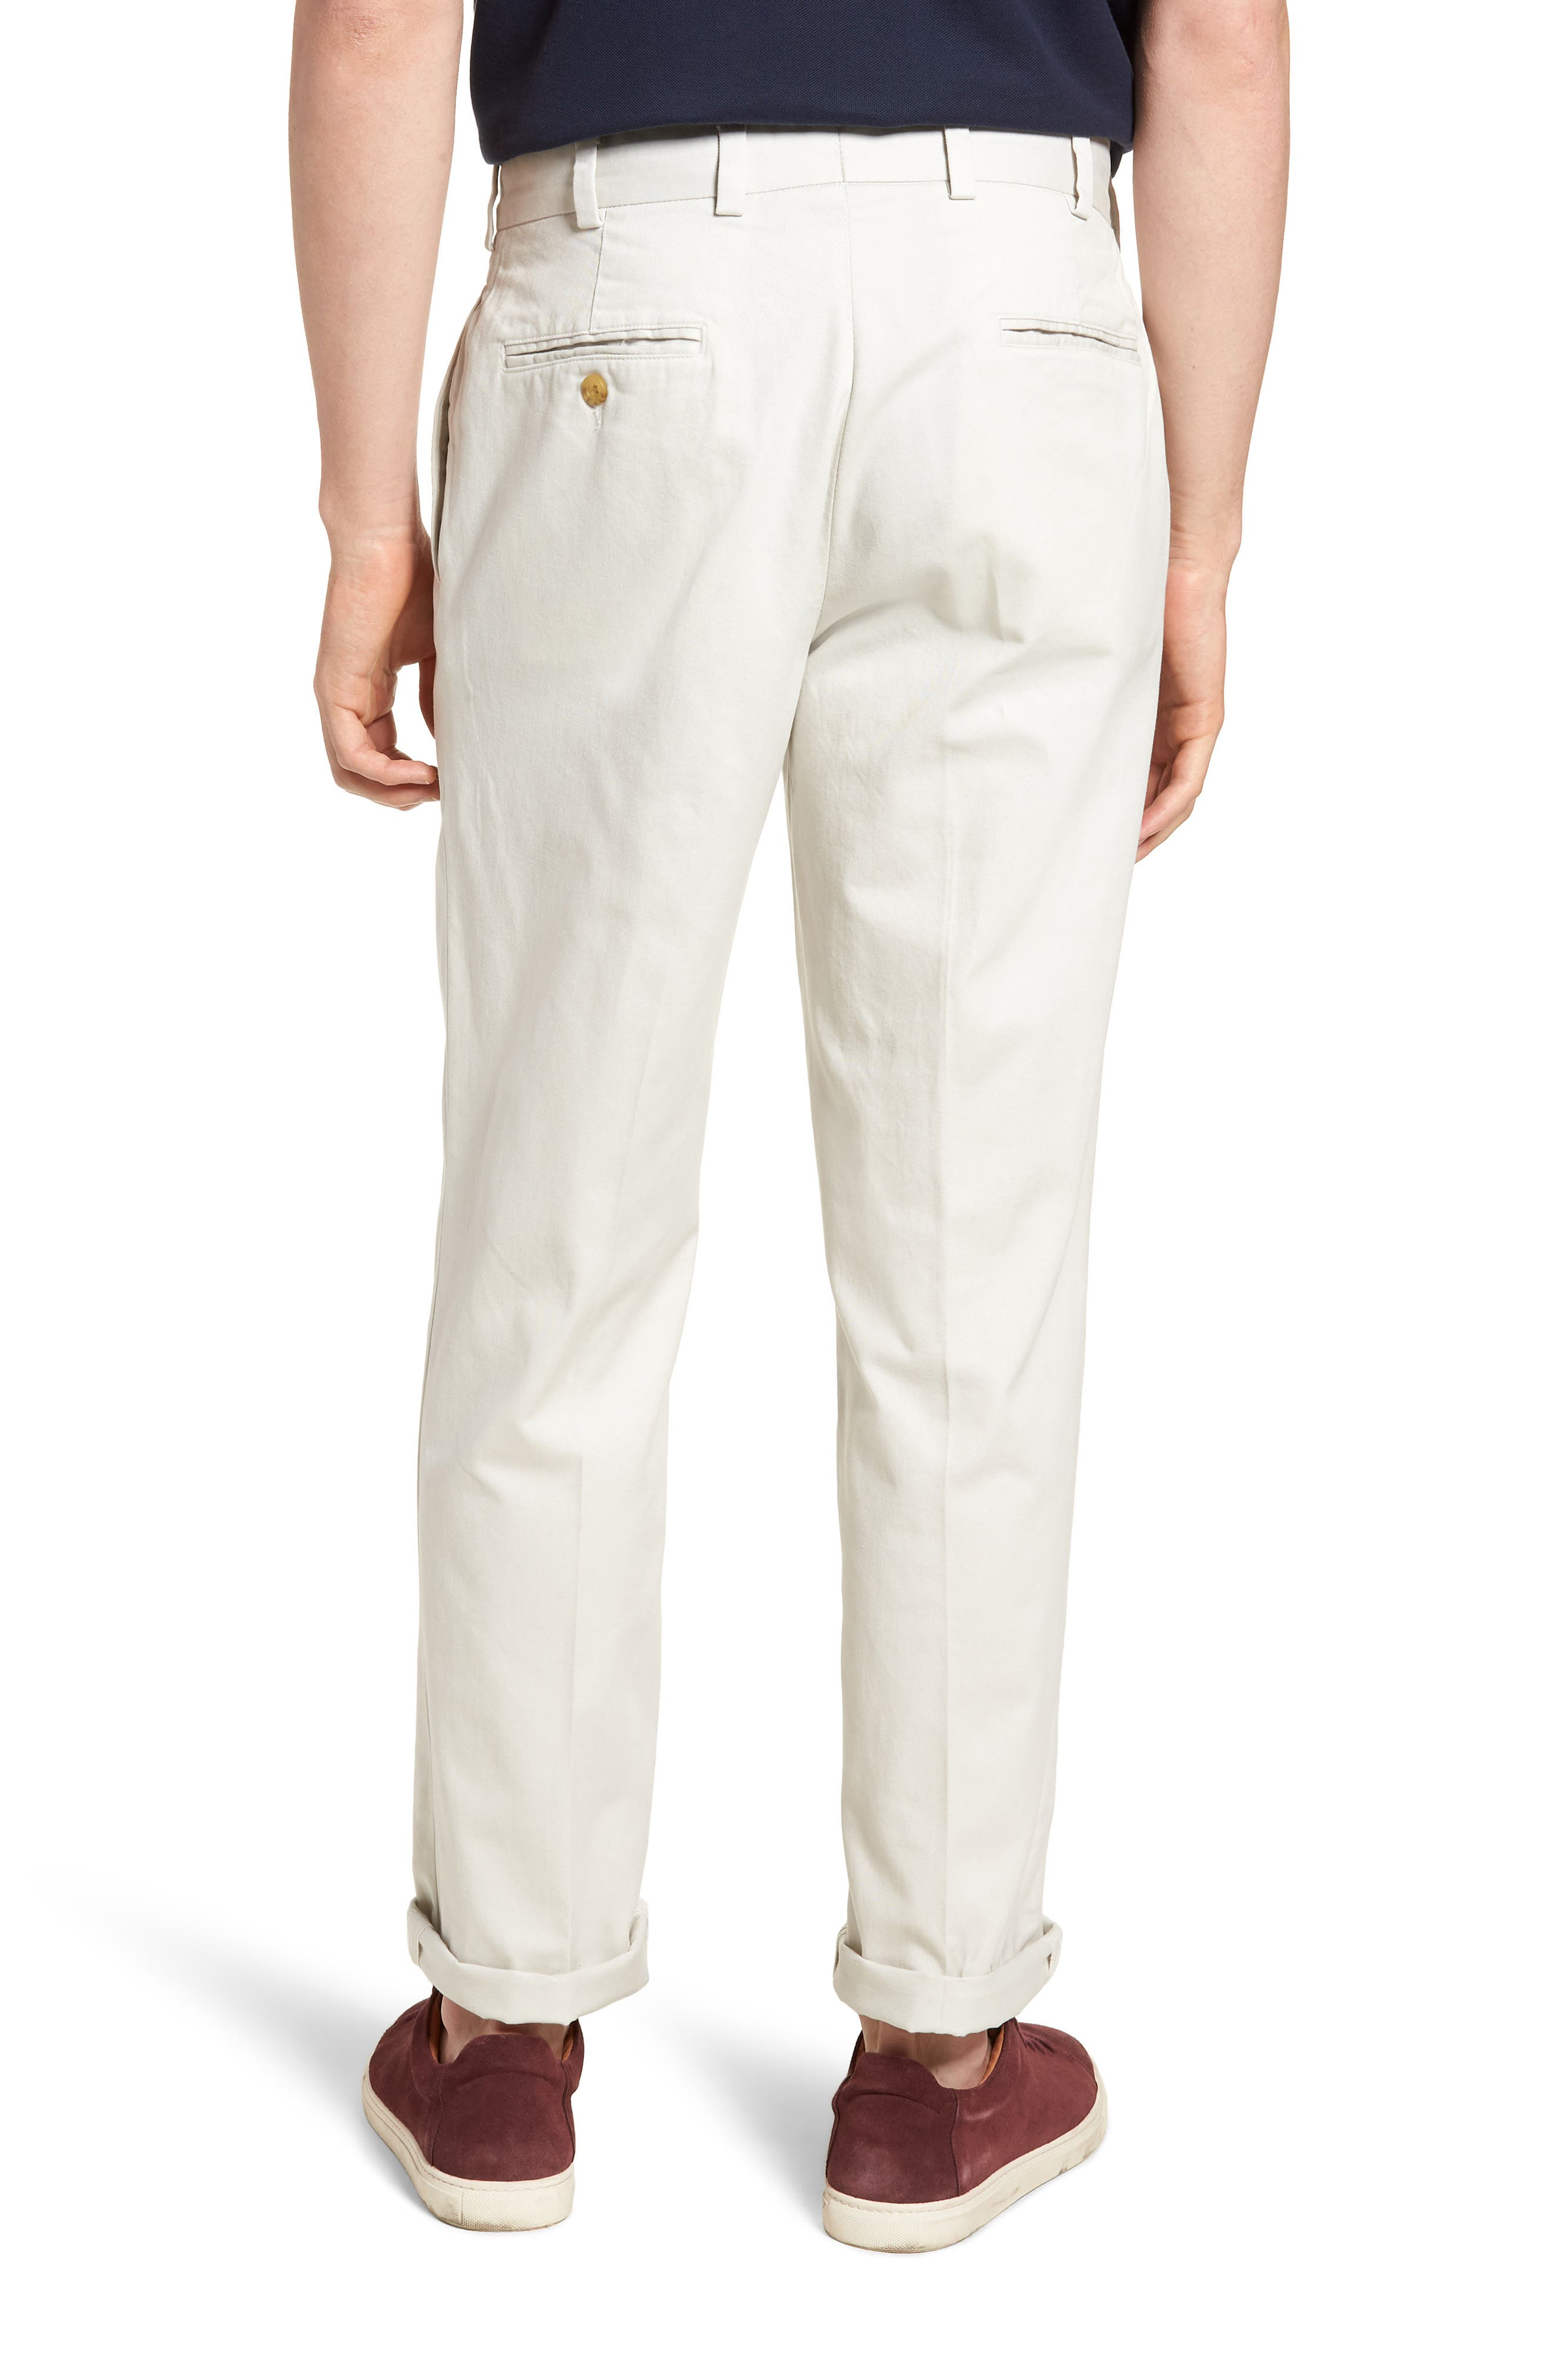 M2 Classic Fit Vintage Twill Flat Front Pants,                             Alternate thumbnail 2, color,                             270